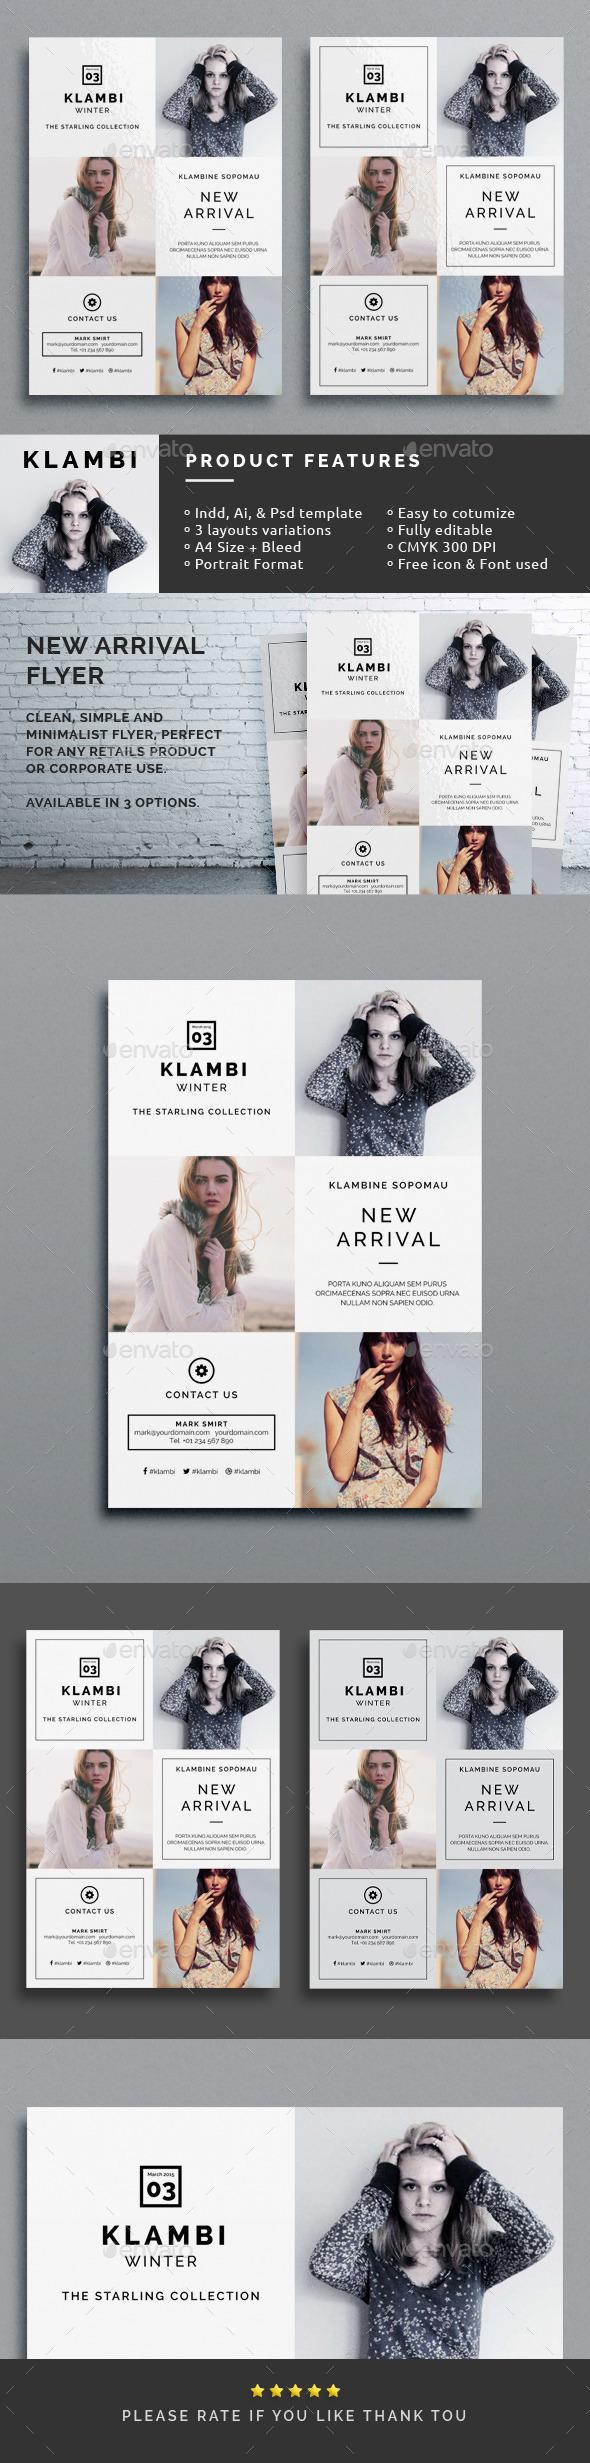 Klambi New Arrival Flyer  - Corporate Flyers